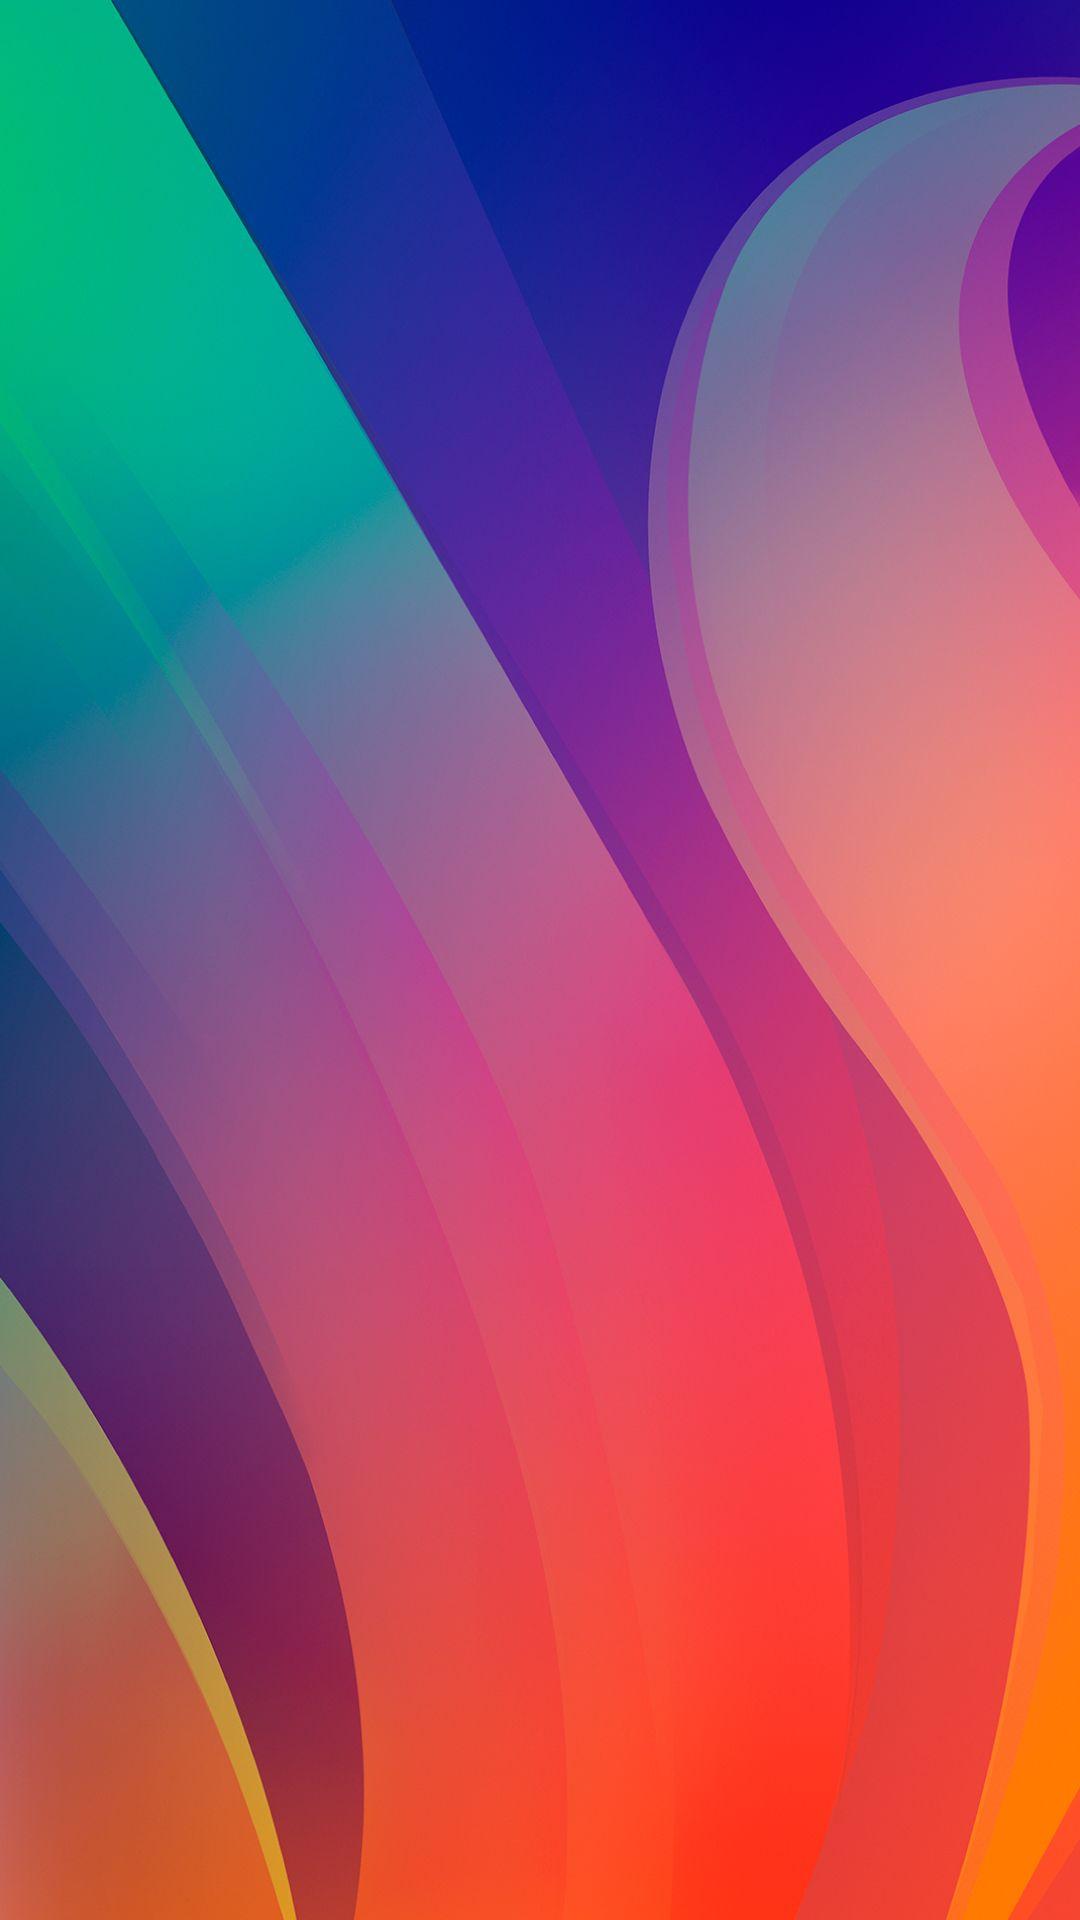 Nice iPhone lock screen wallpaper